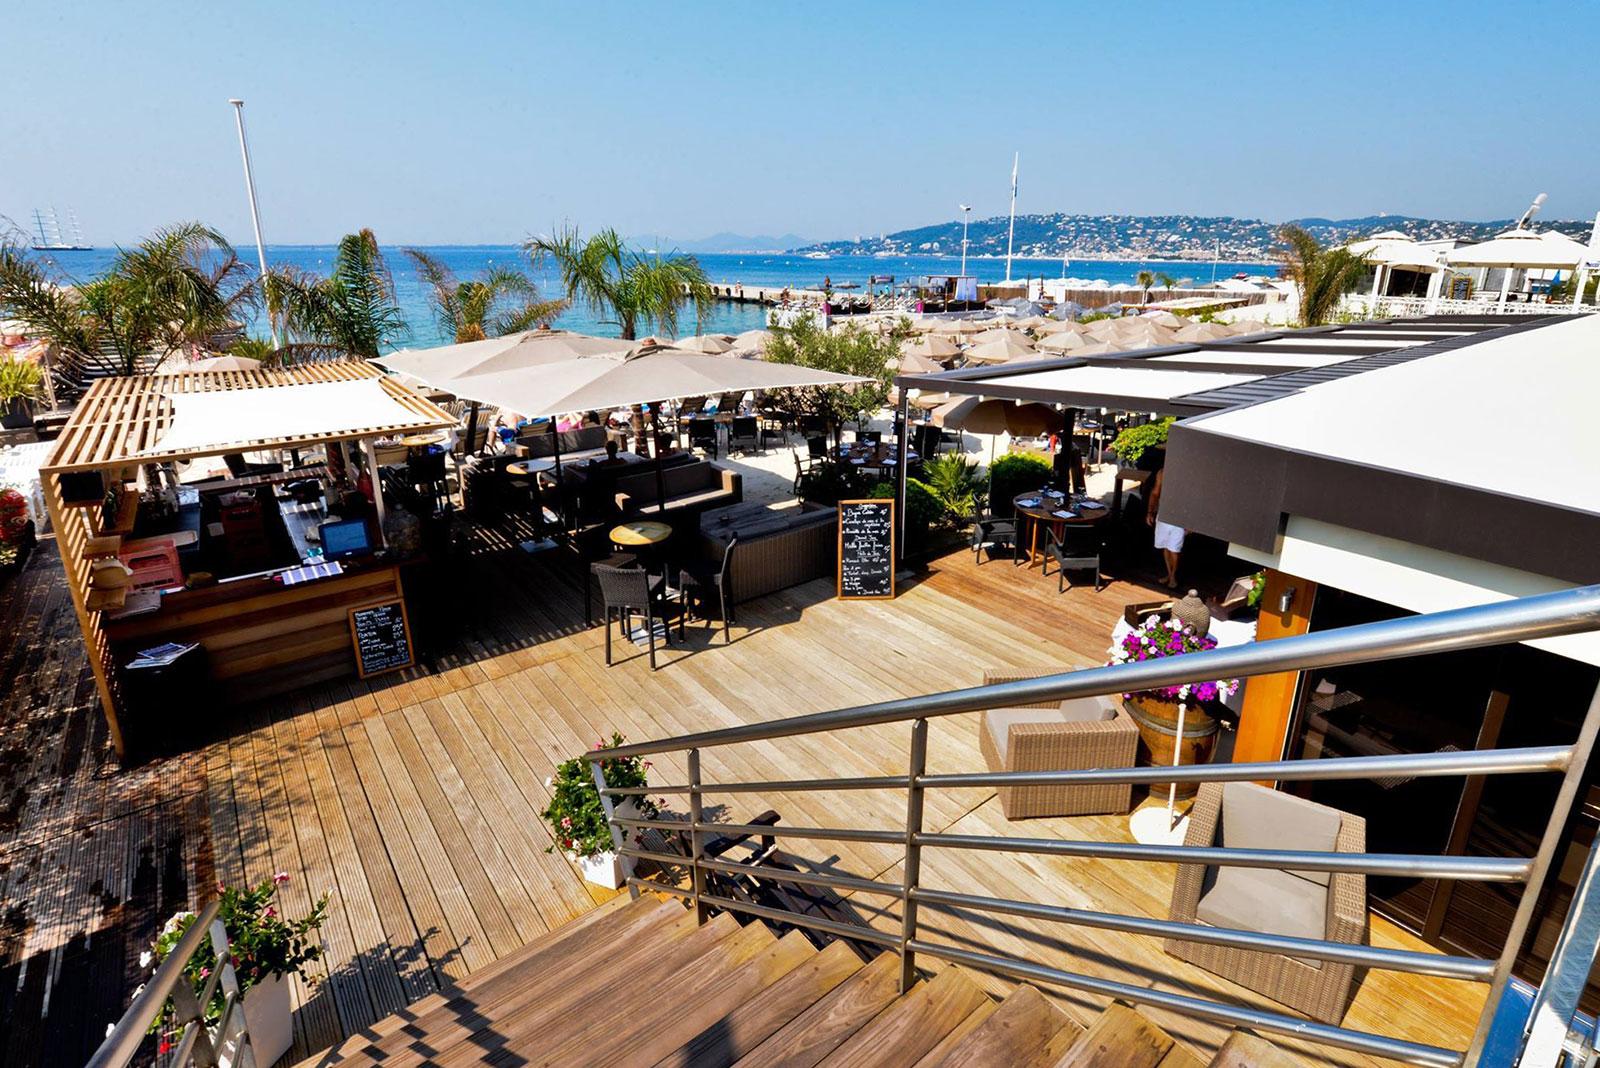 plage-restaurant-antibes-juan-les-pins-29